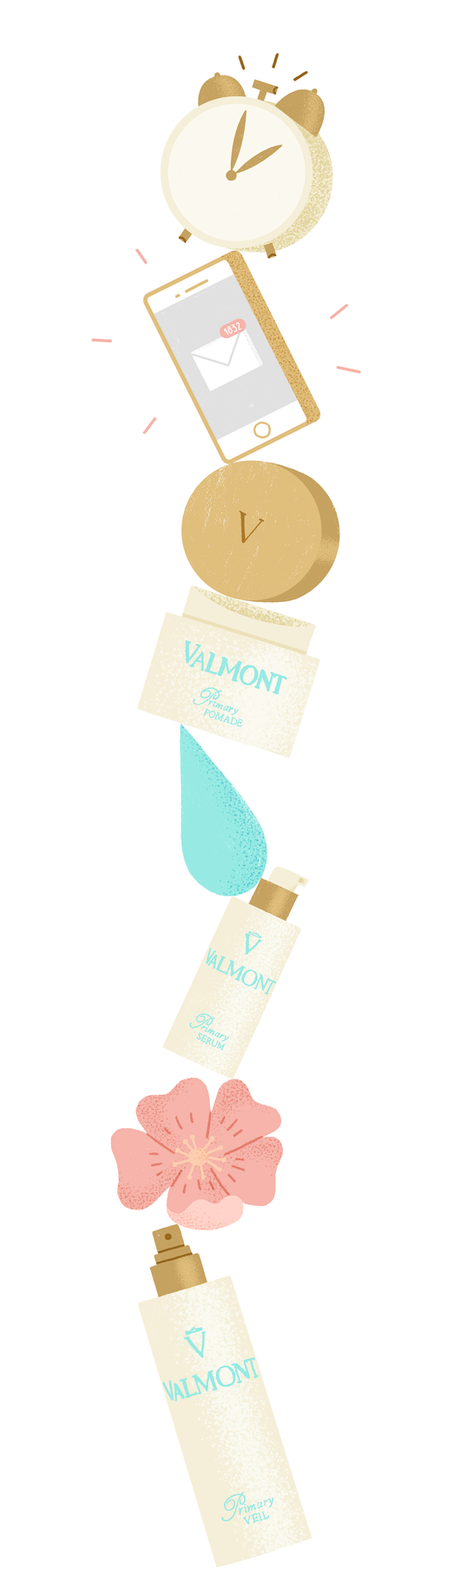 The Blueprint x Valmont